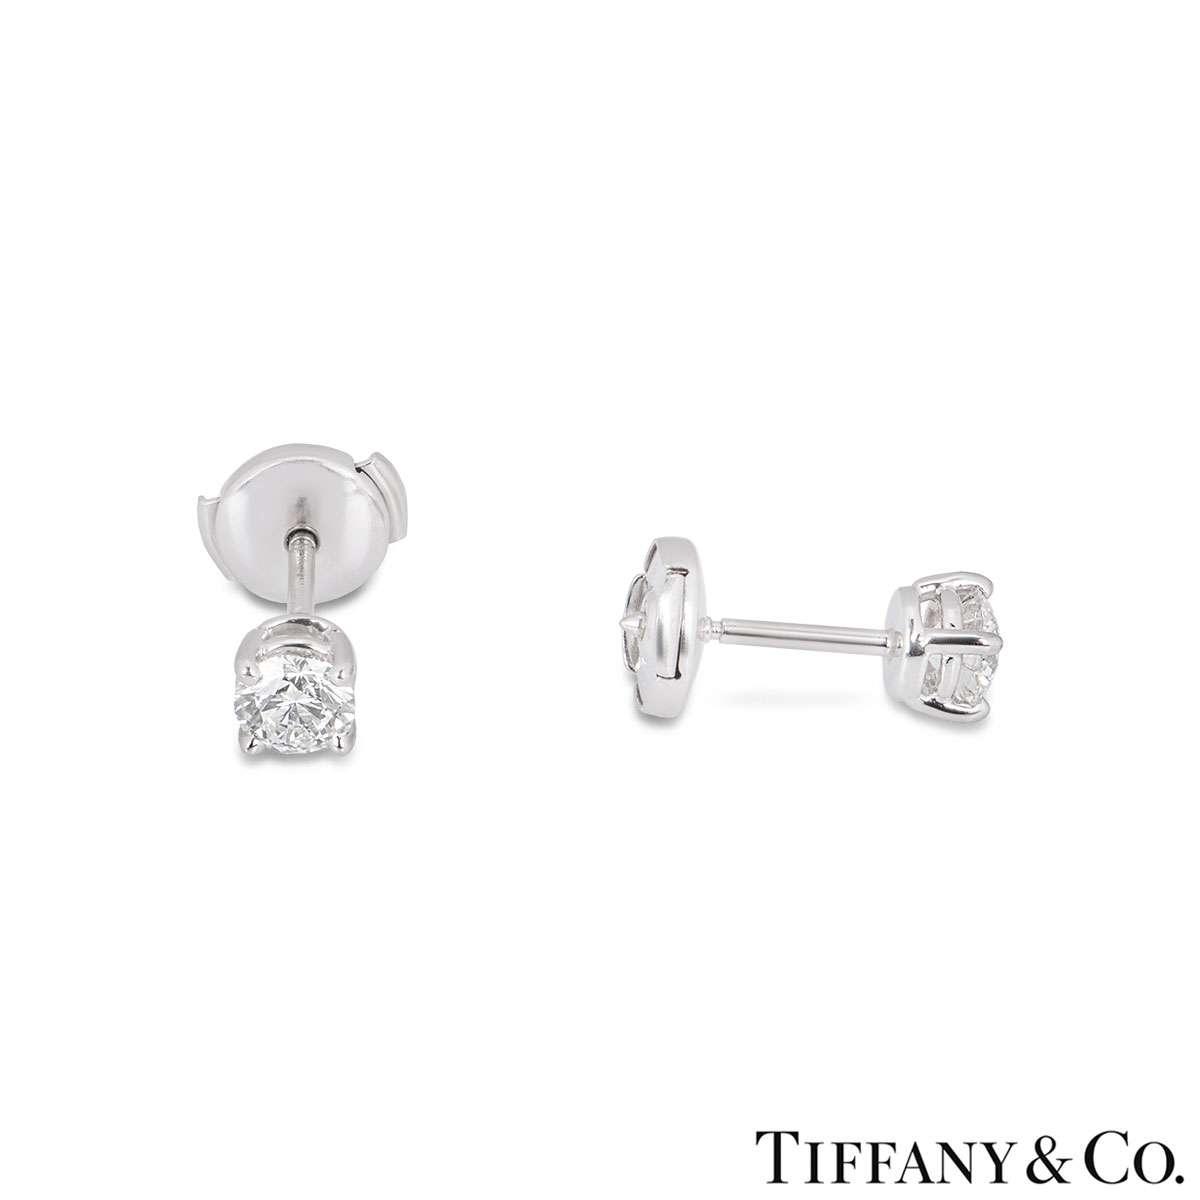 Tiffany & Co. Diamond Ear Studs 0.80ct TDW